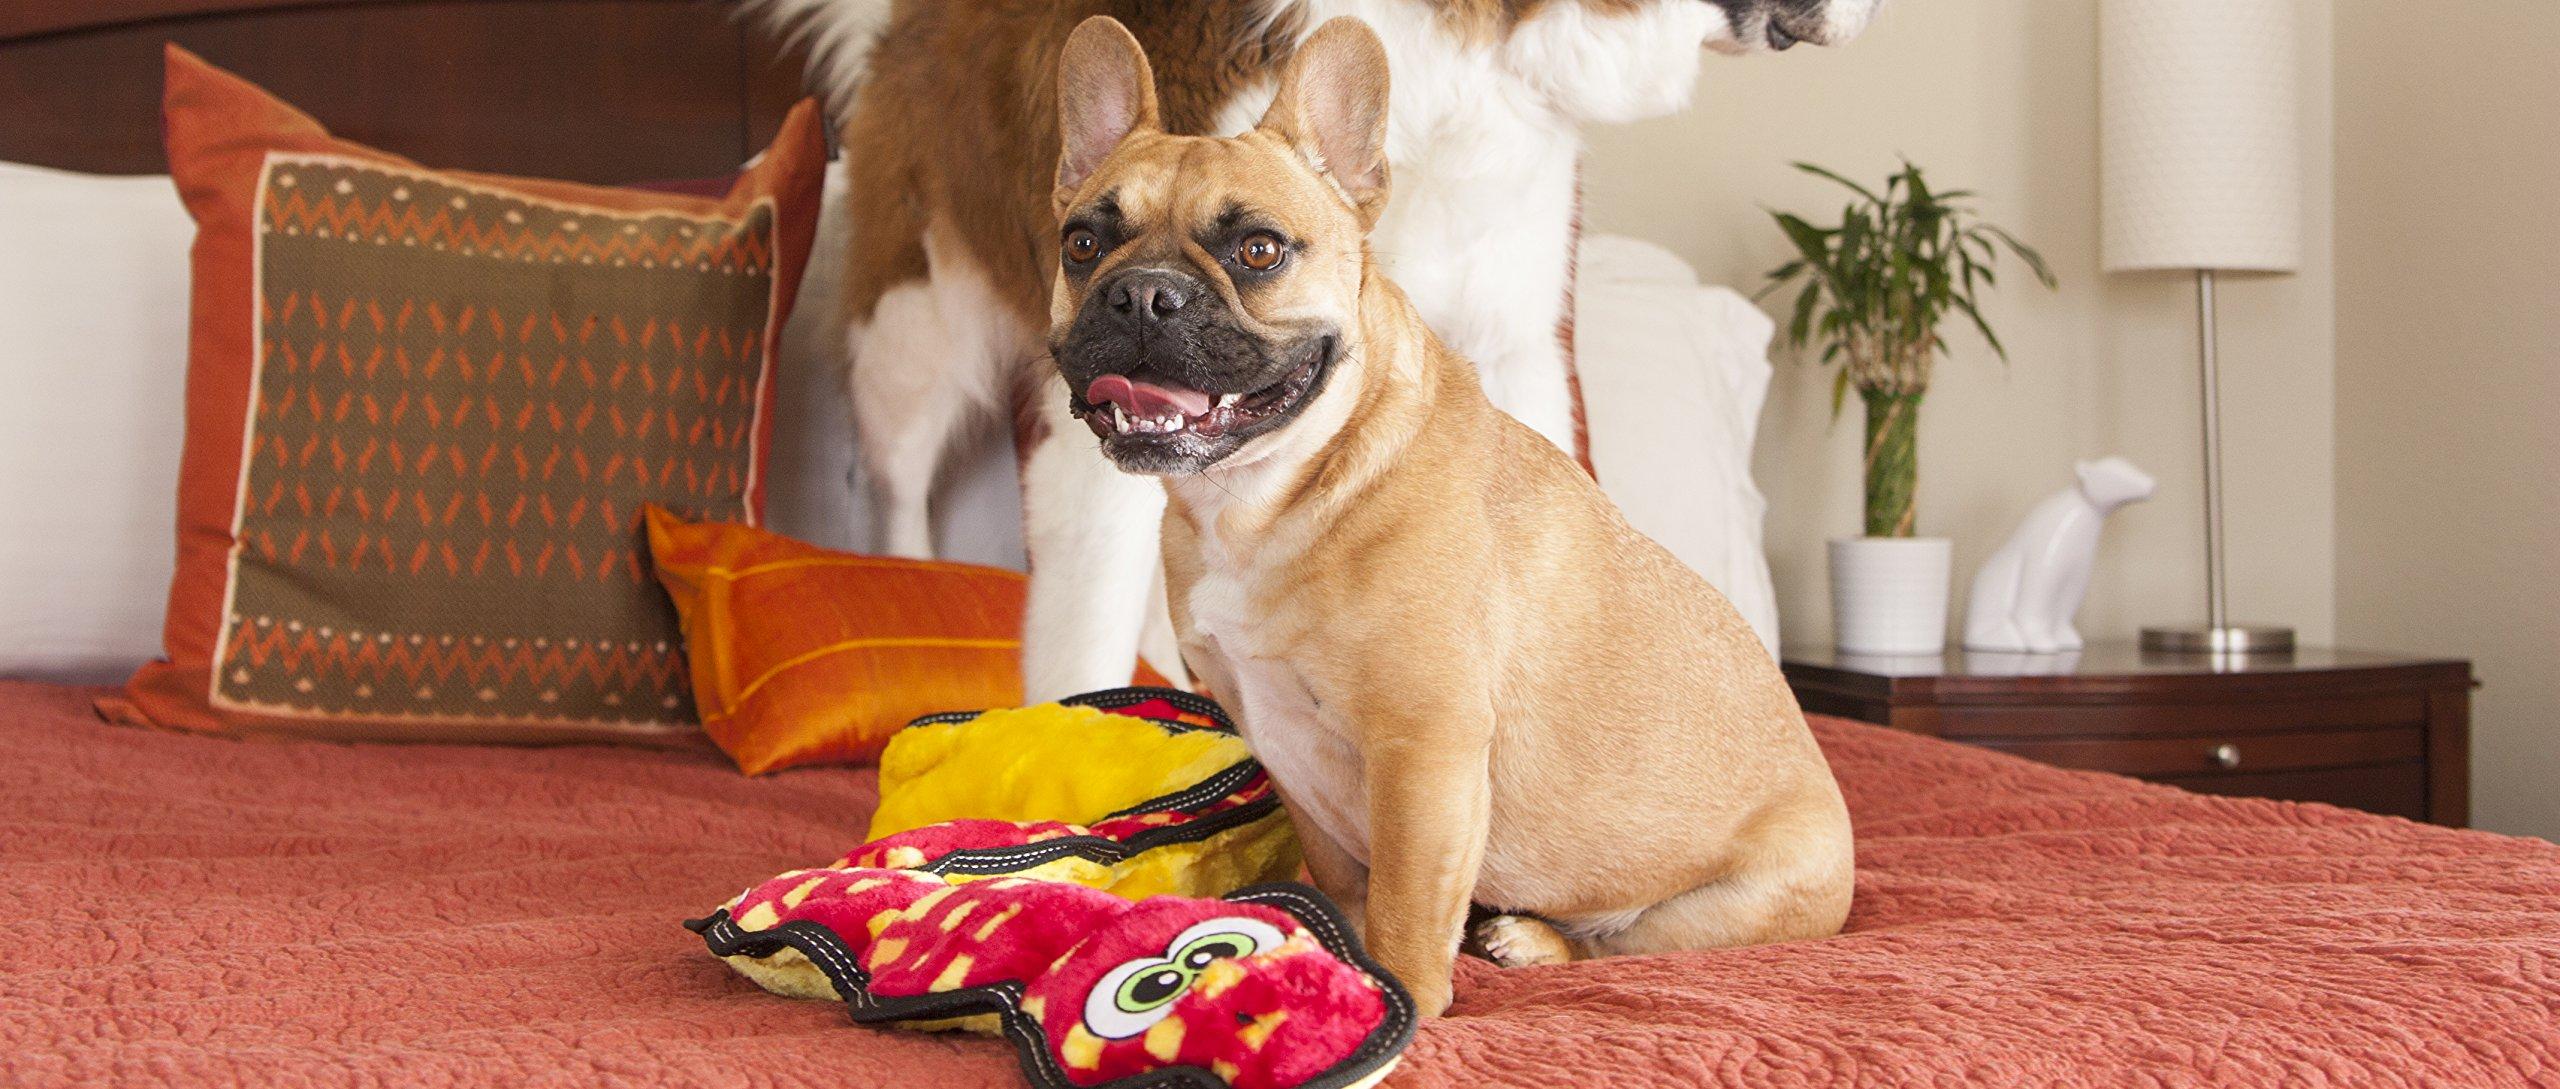 Outward Hound Invincibles Tough Seamz Stuffingless Durable Tough Plush Toy for Dogs, Tough Squeaky Dog Toy by, Snake, 3 Squeakers by Outward Hound (Image #2)